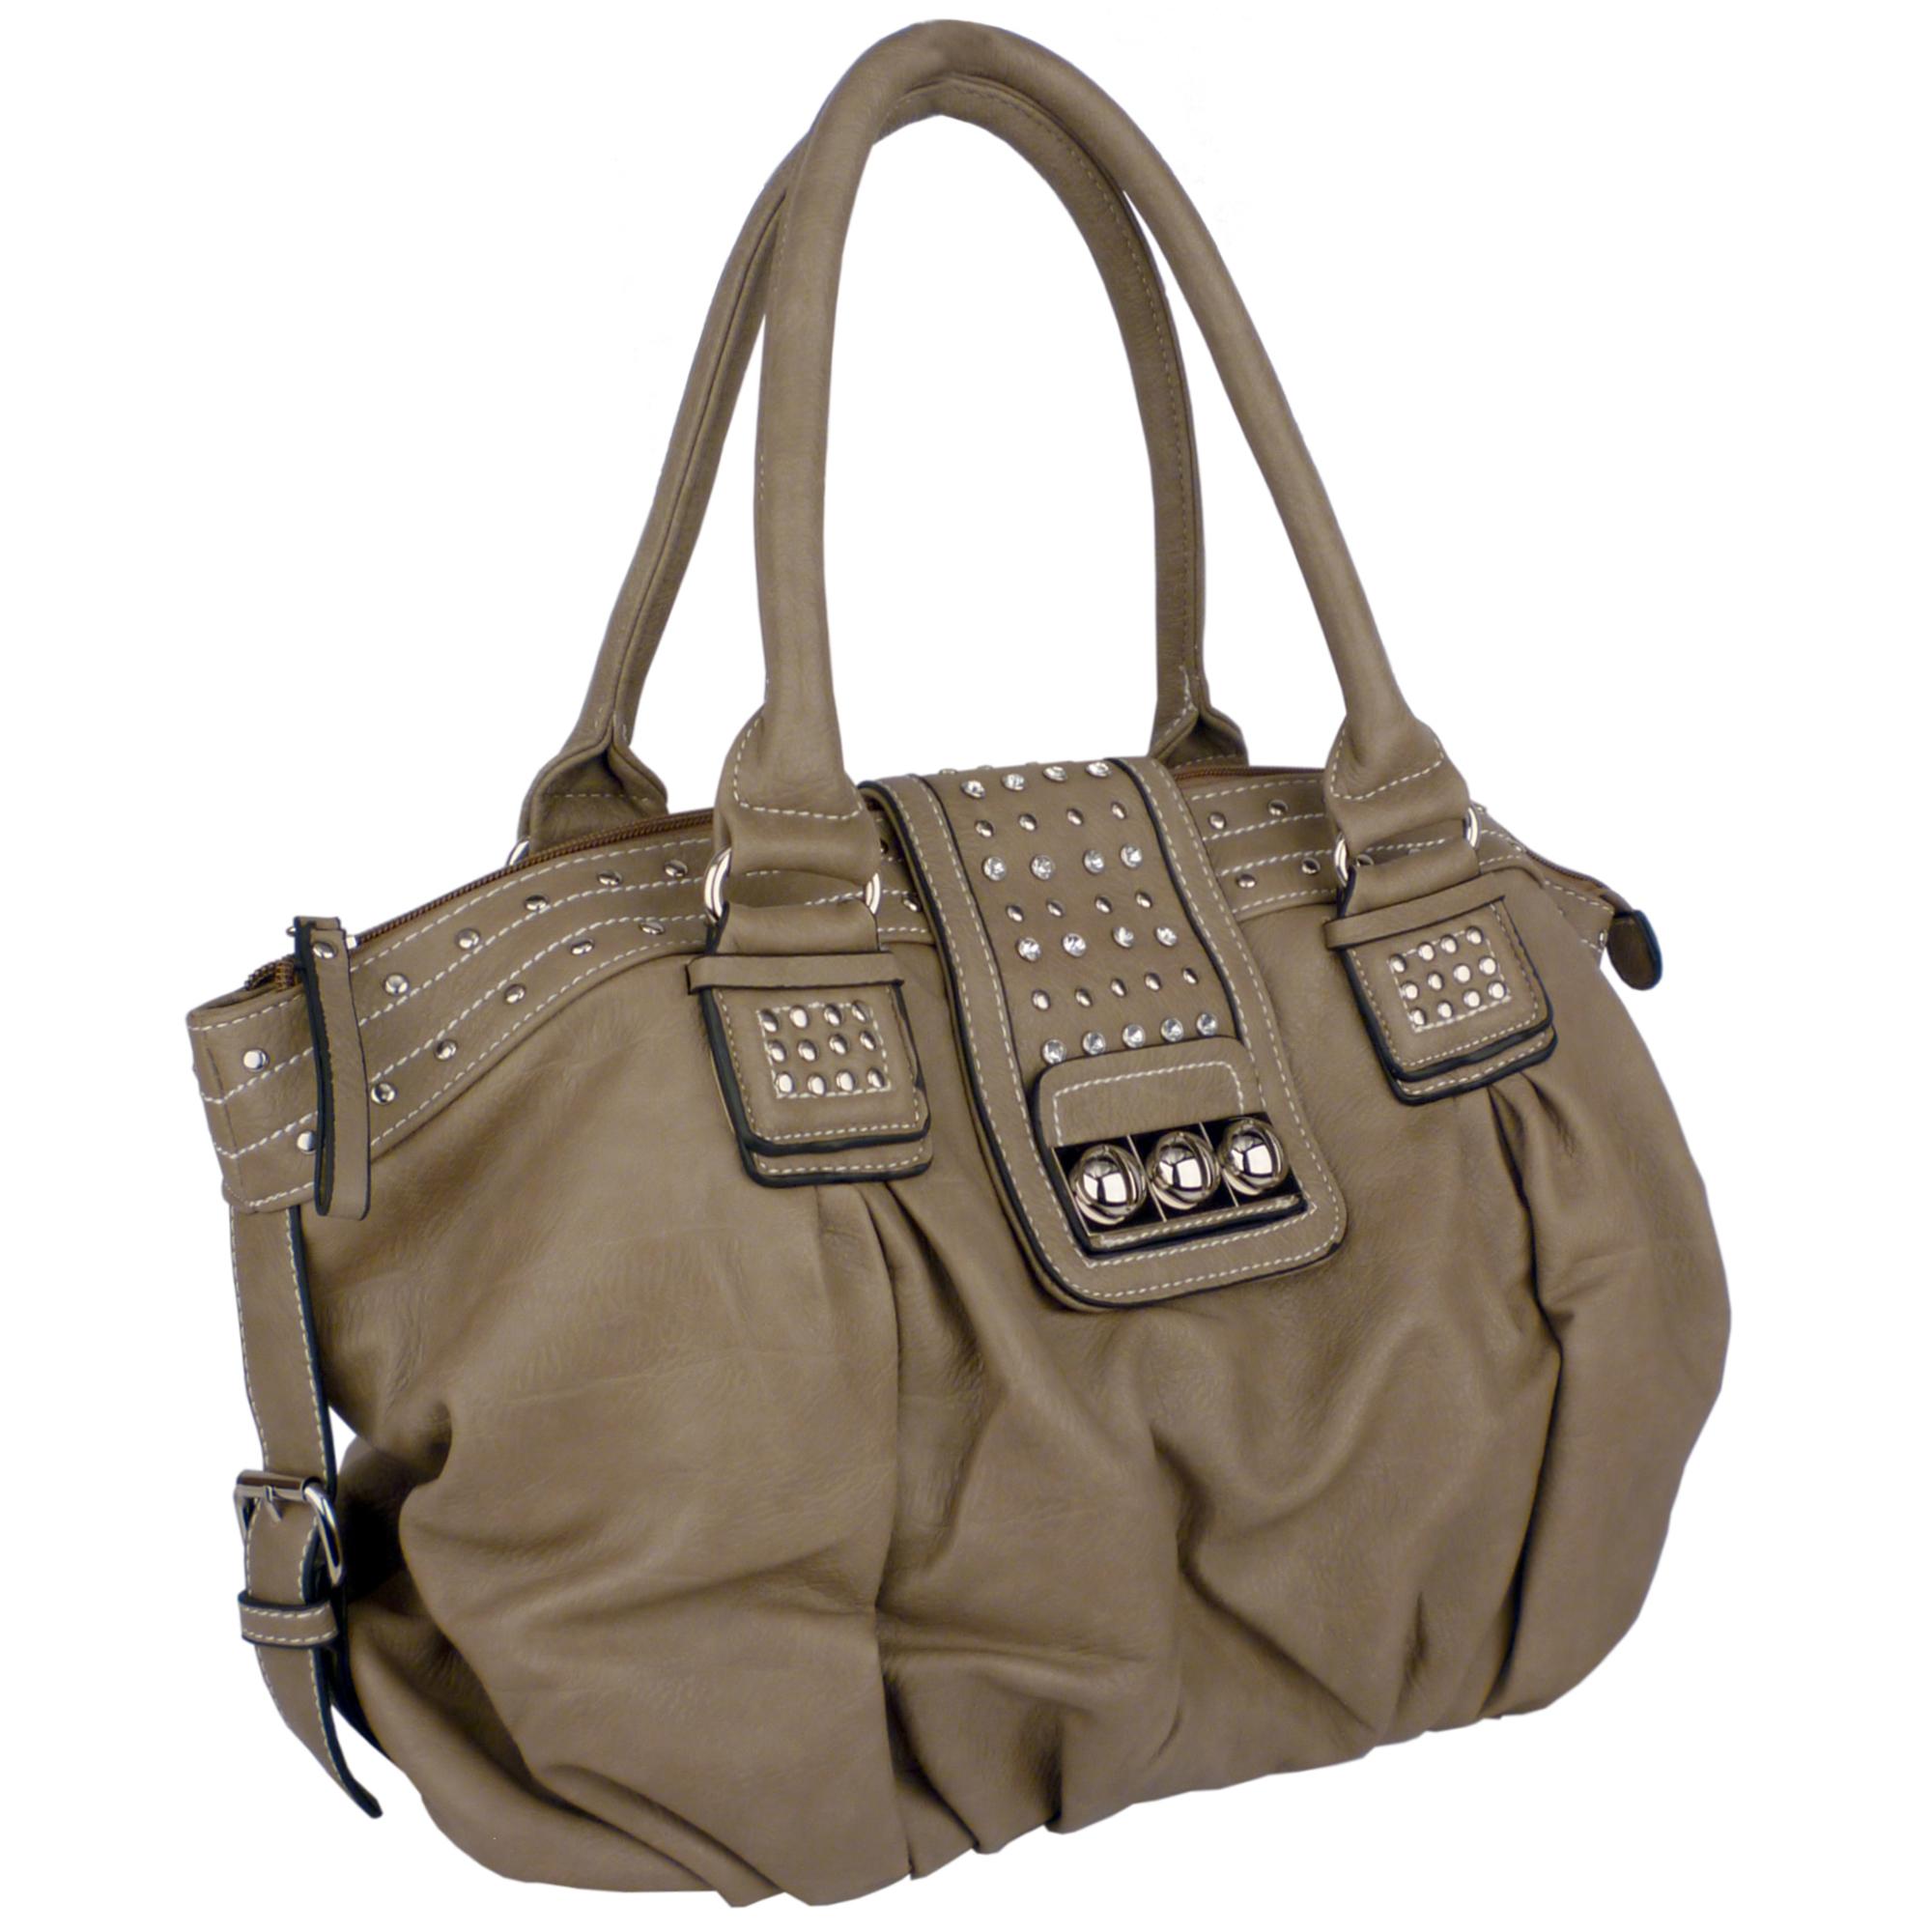 BRENNA Camel Studded Soft Shopper Style Hobo Handbag Angled